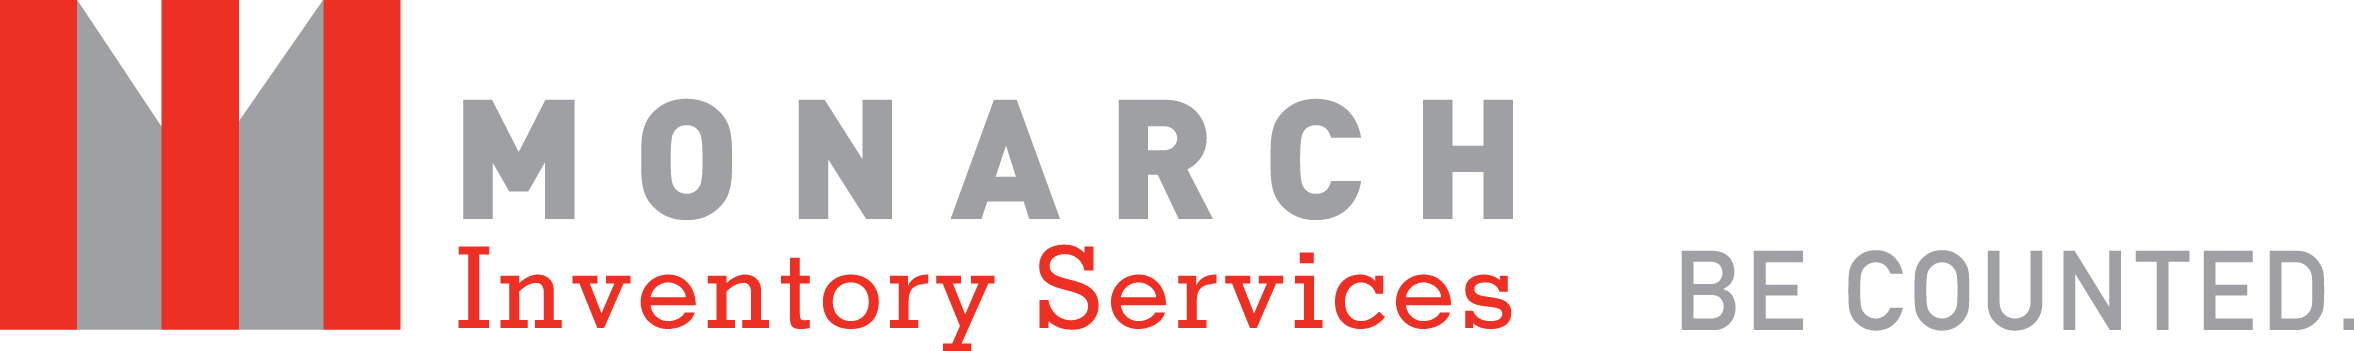 Monarch Inventory Services